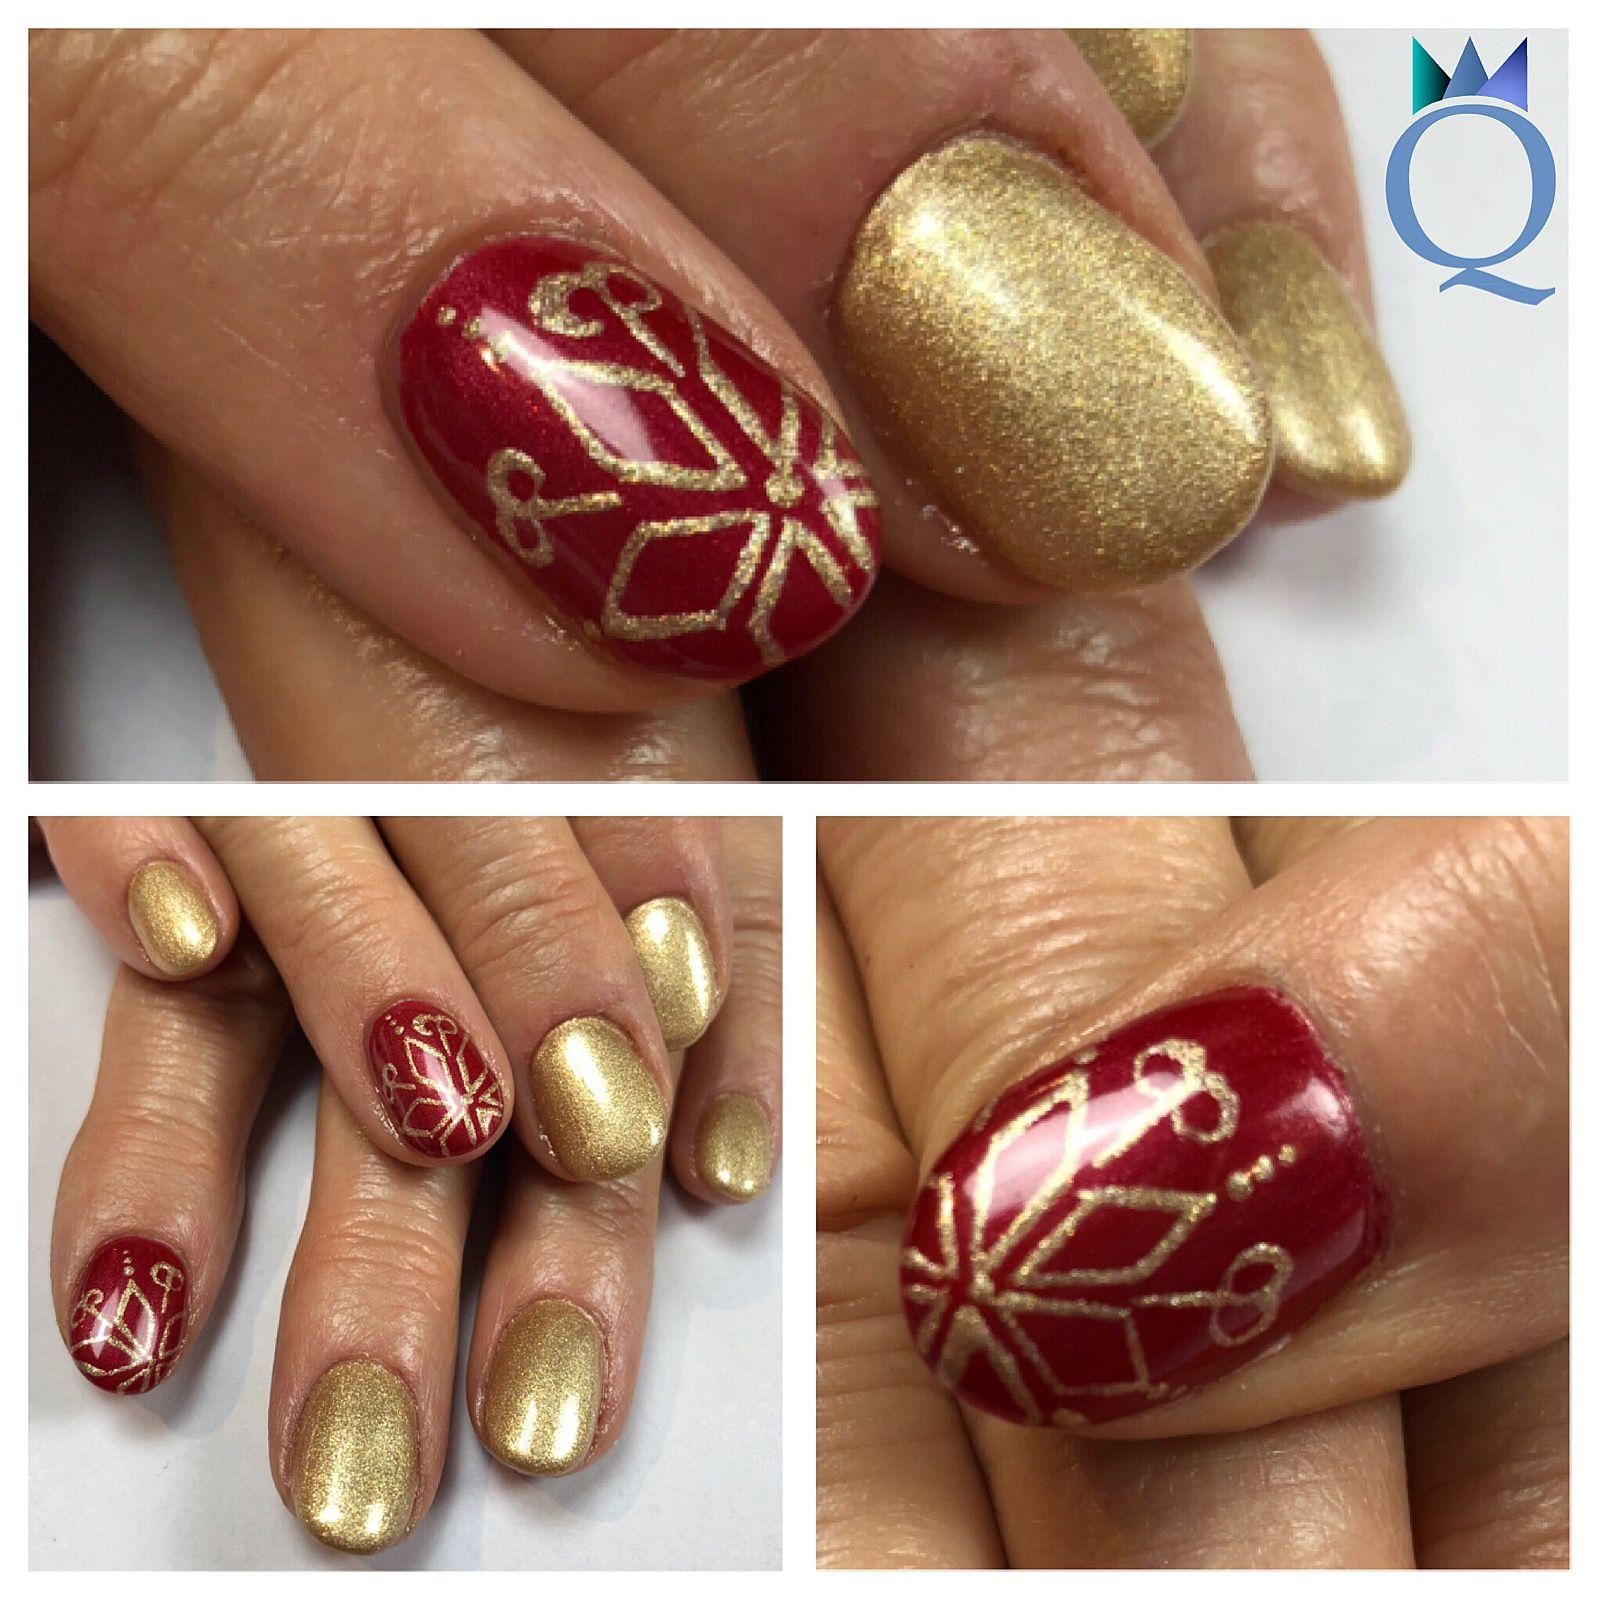 shortnails #gelnails #nails #christmasnails #red #gold #glitter ...